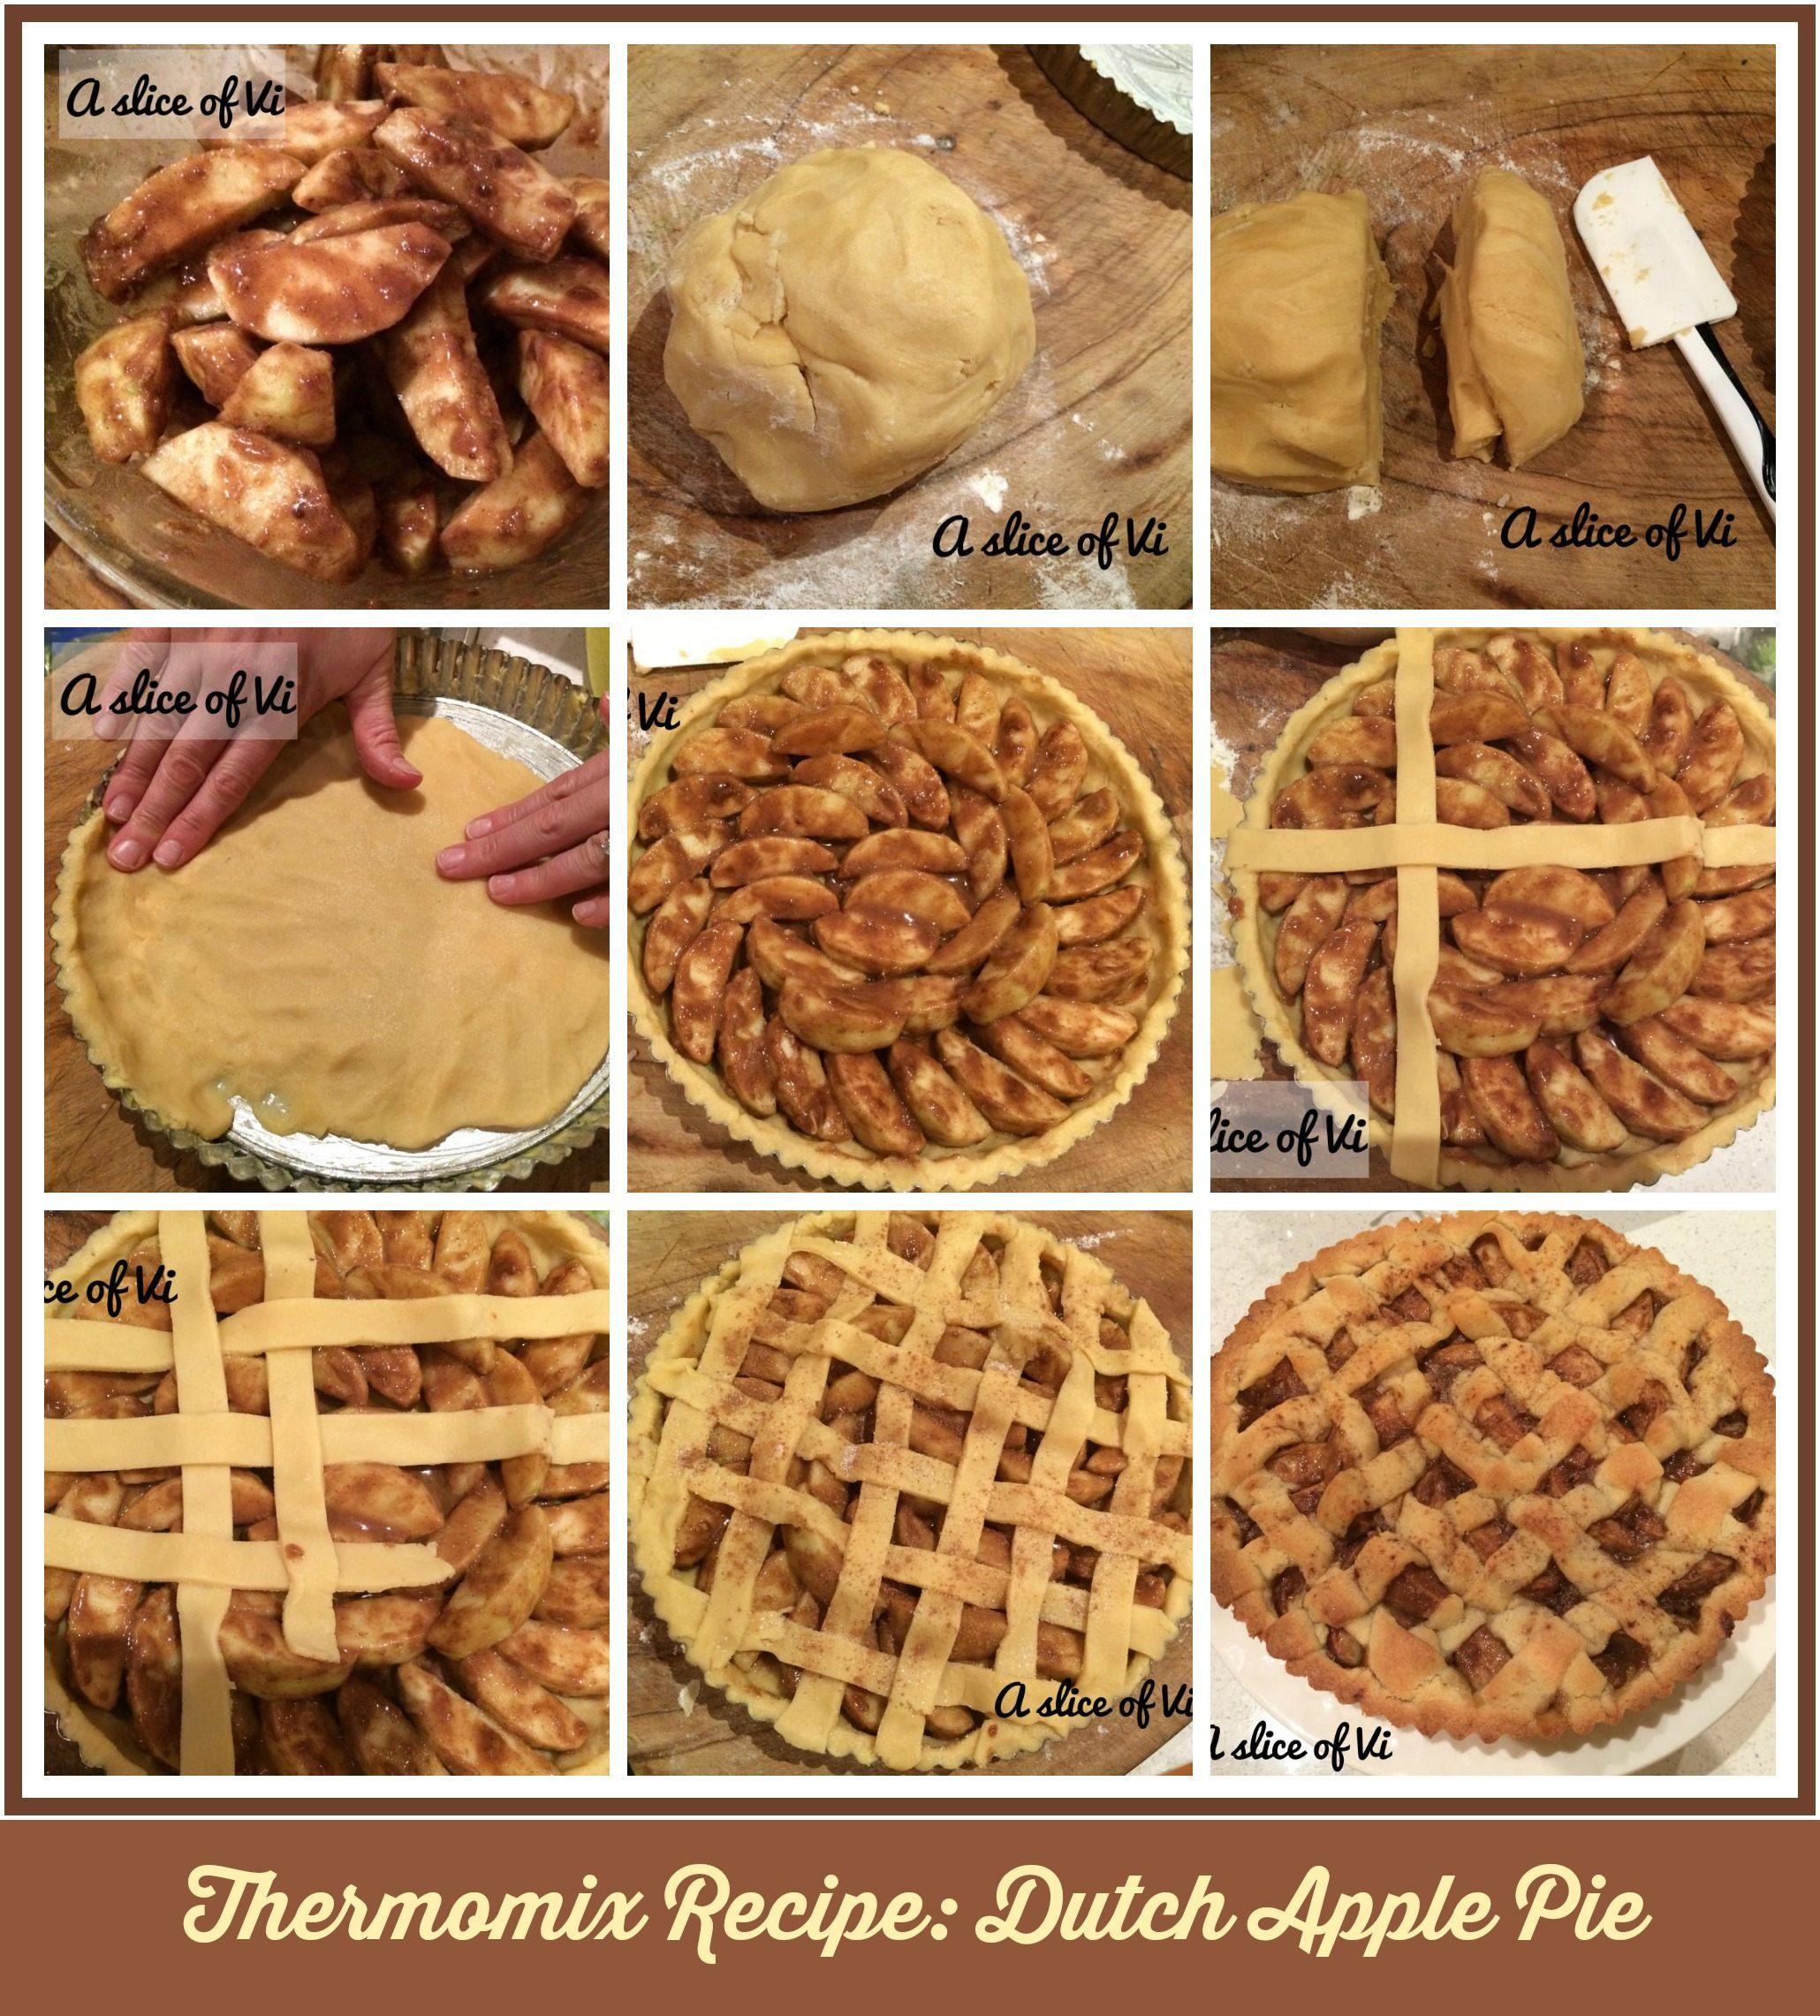 Thermomix Recipe Dutch Apple pie